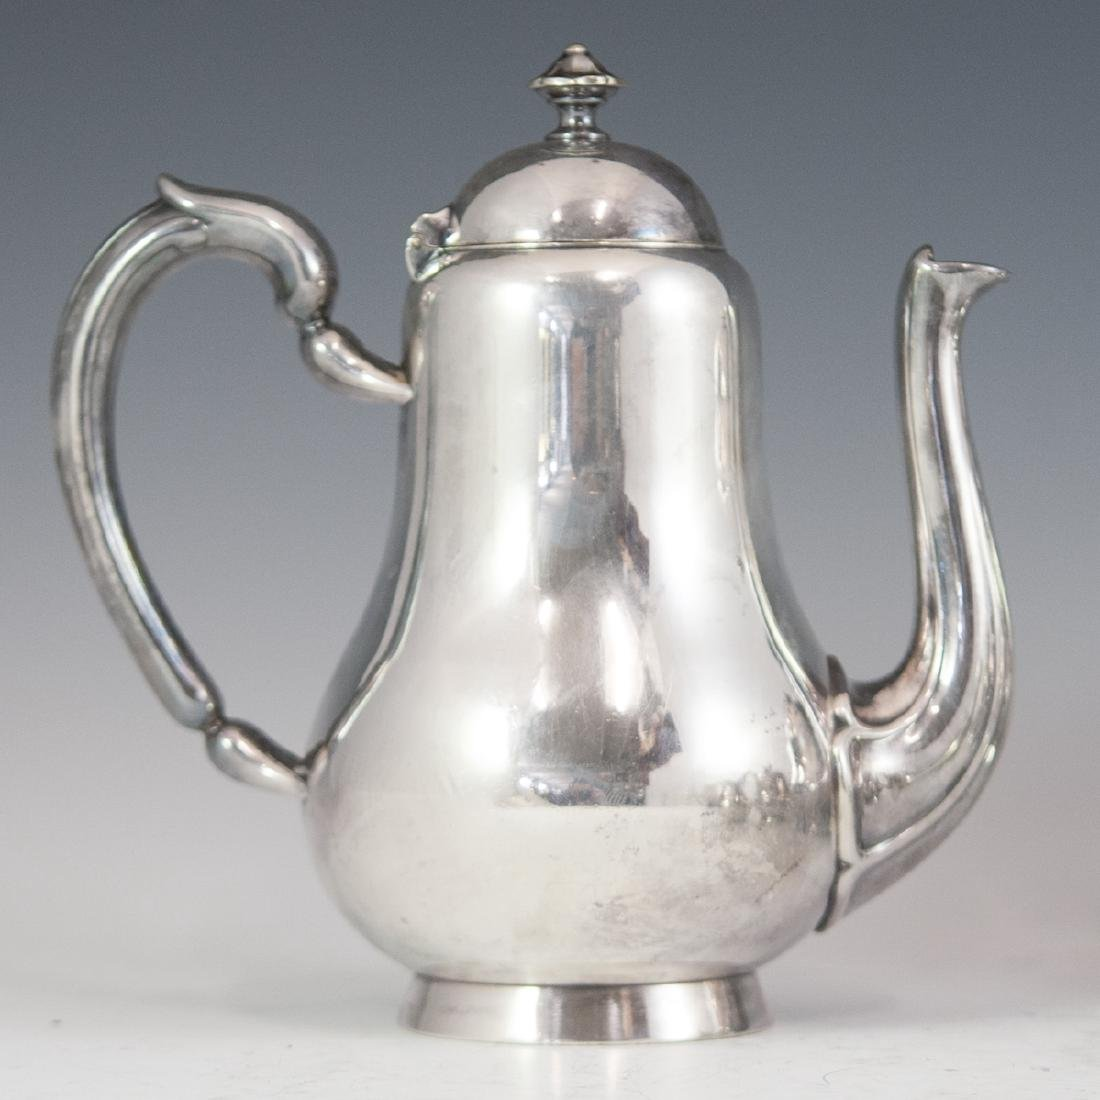 Antique Christofle Silverplated Tea Set - 2